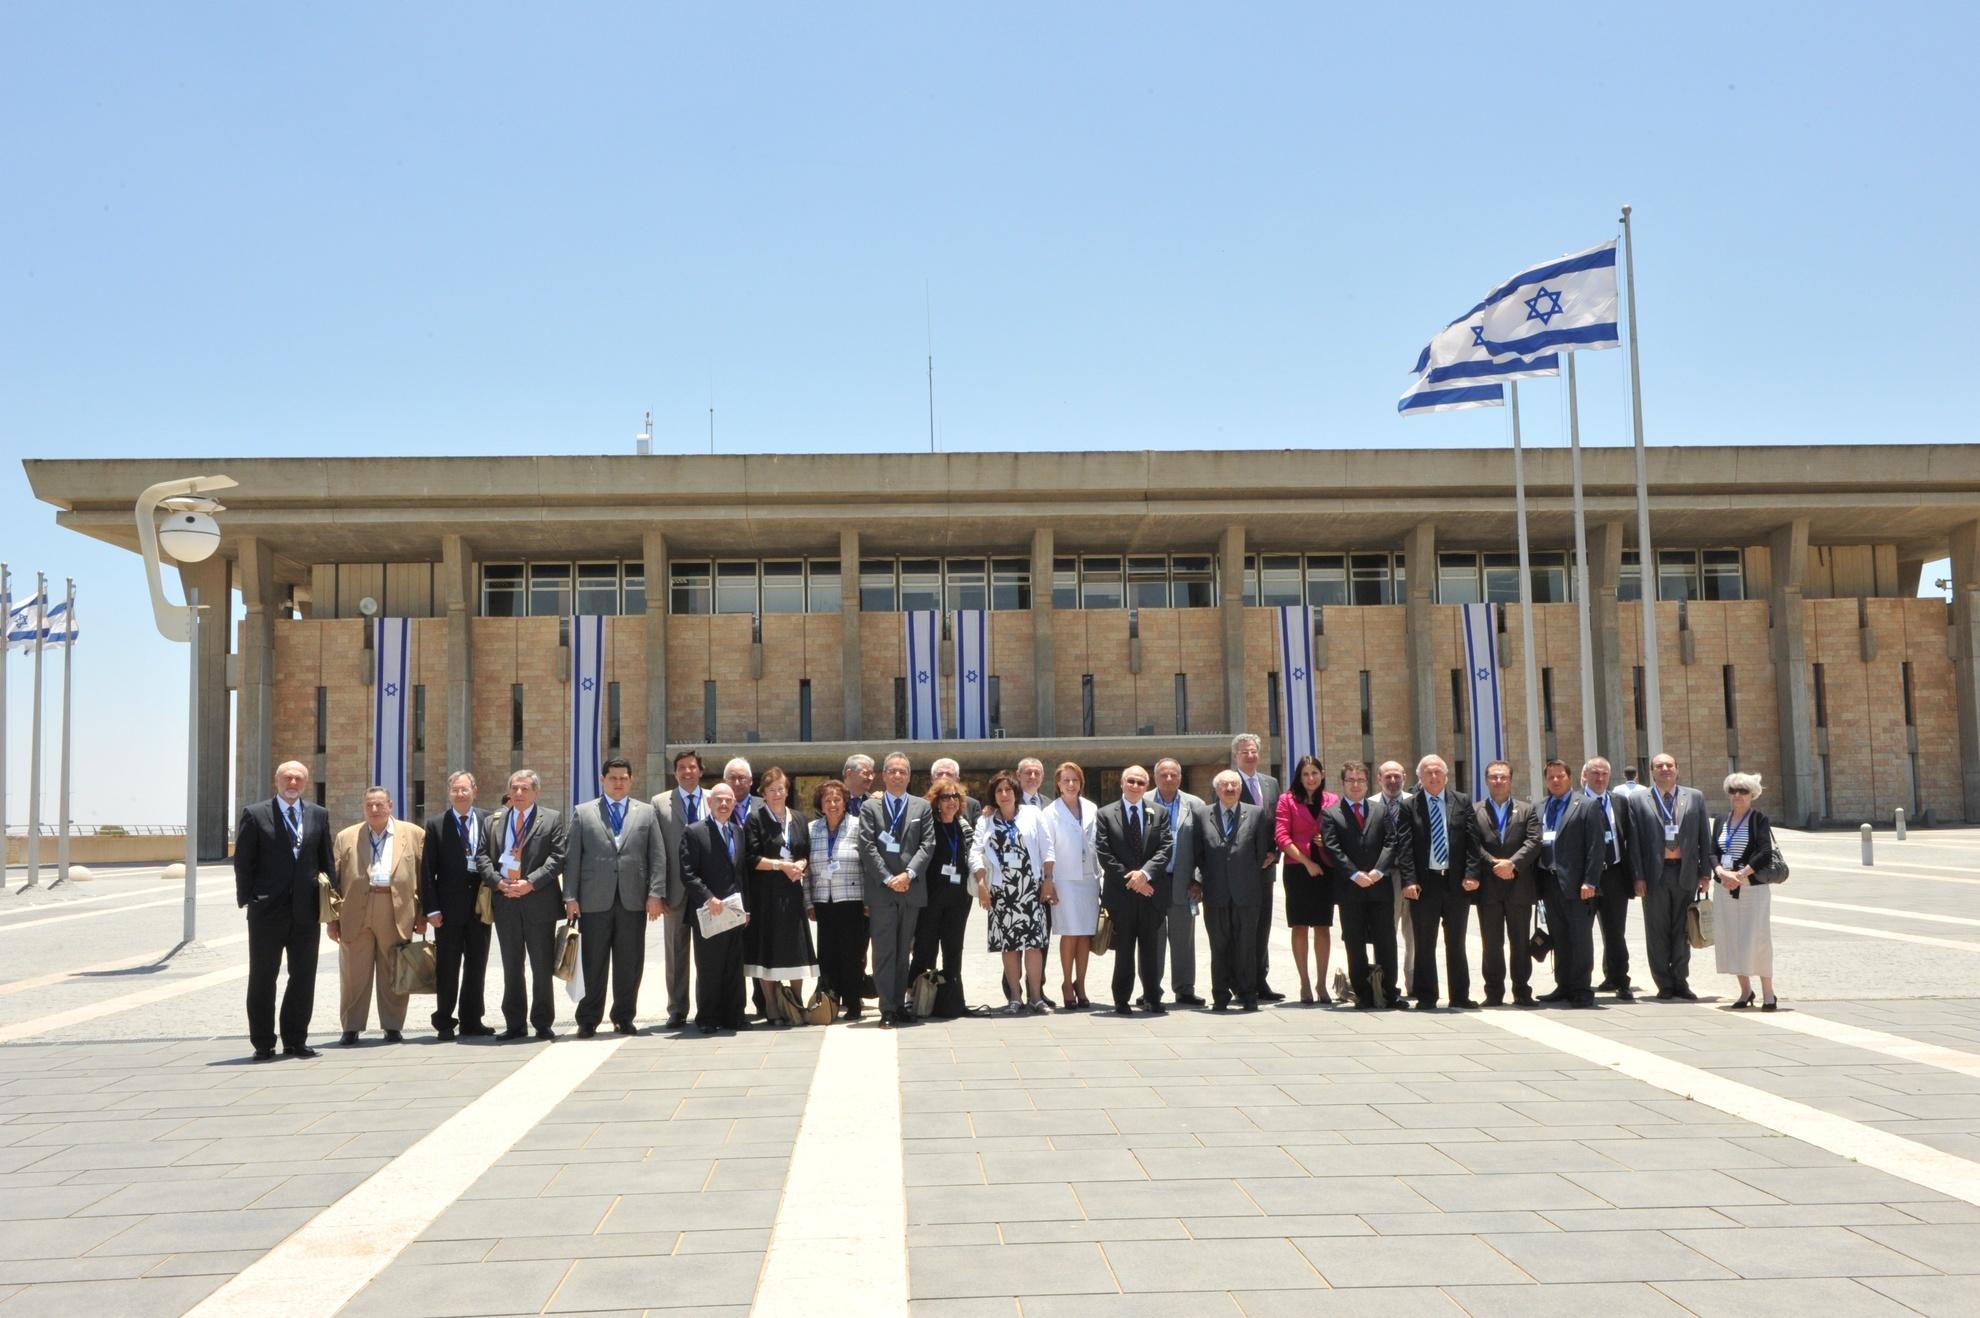 International Consultation of Jewish Parliamentarians, Jerusalem (Israel), 27 - 29 Jun 2011